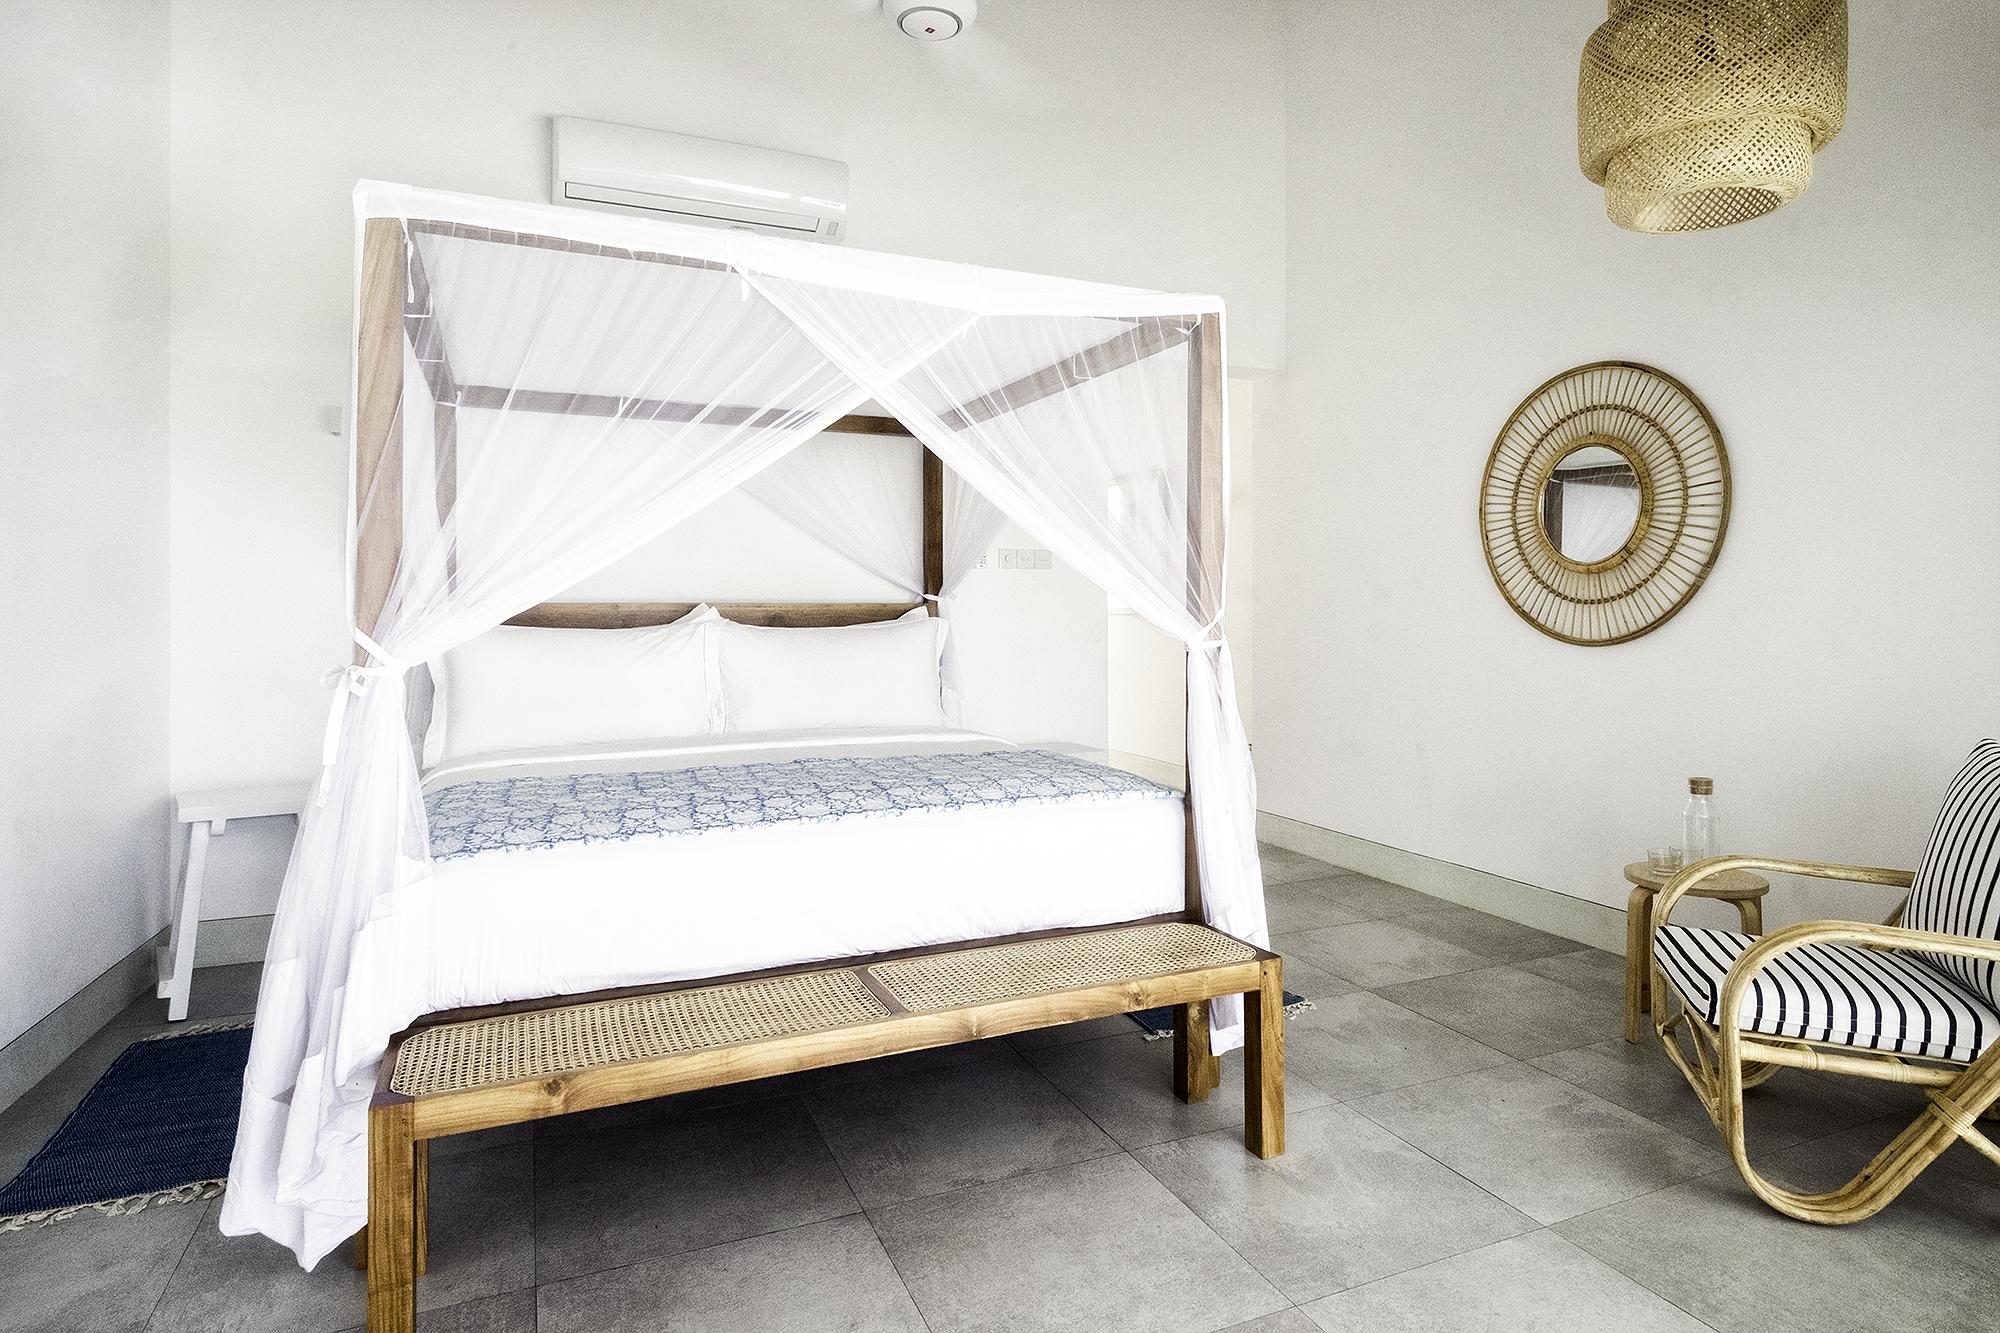 Bedroom 2 with ocean views